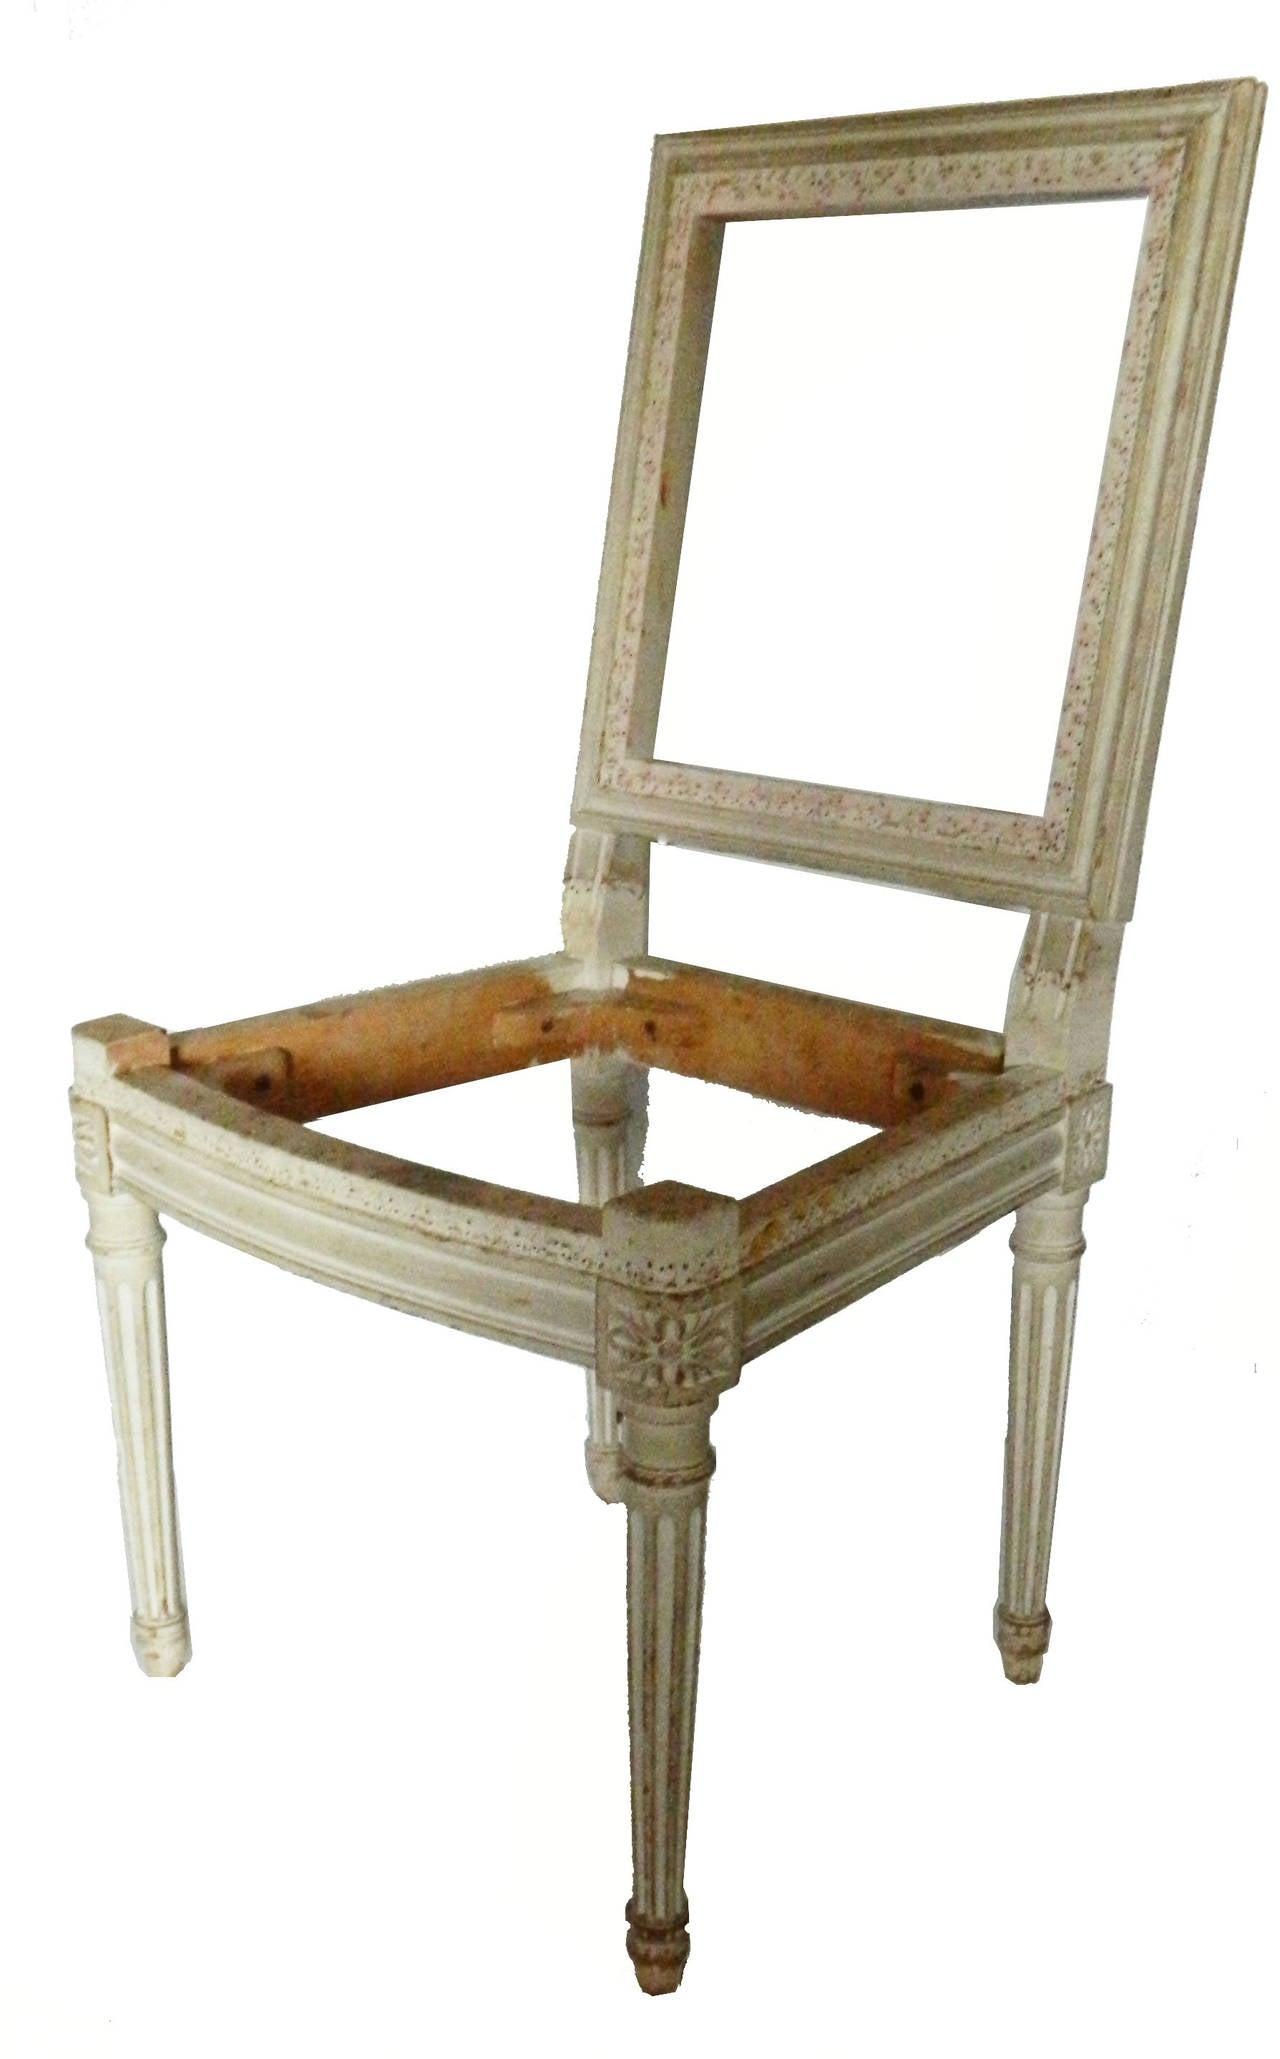 Maison Jansen Set Of 6 Chairs At 1stdibs